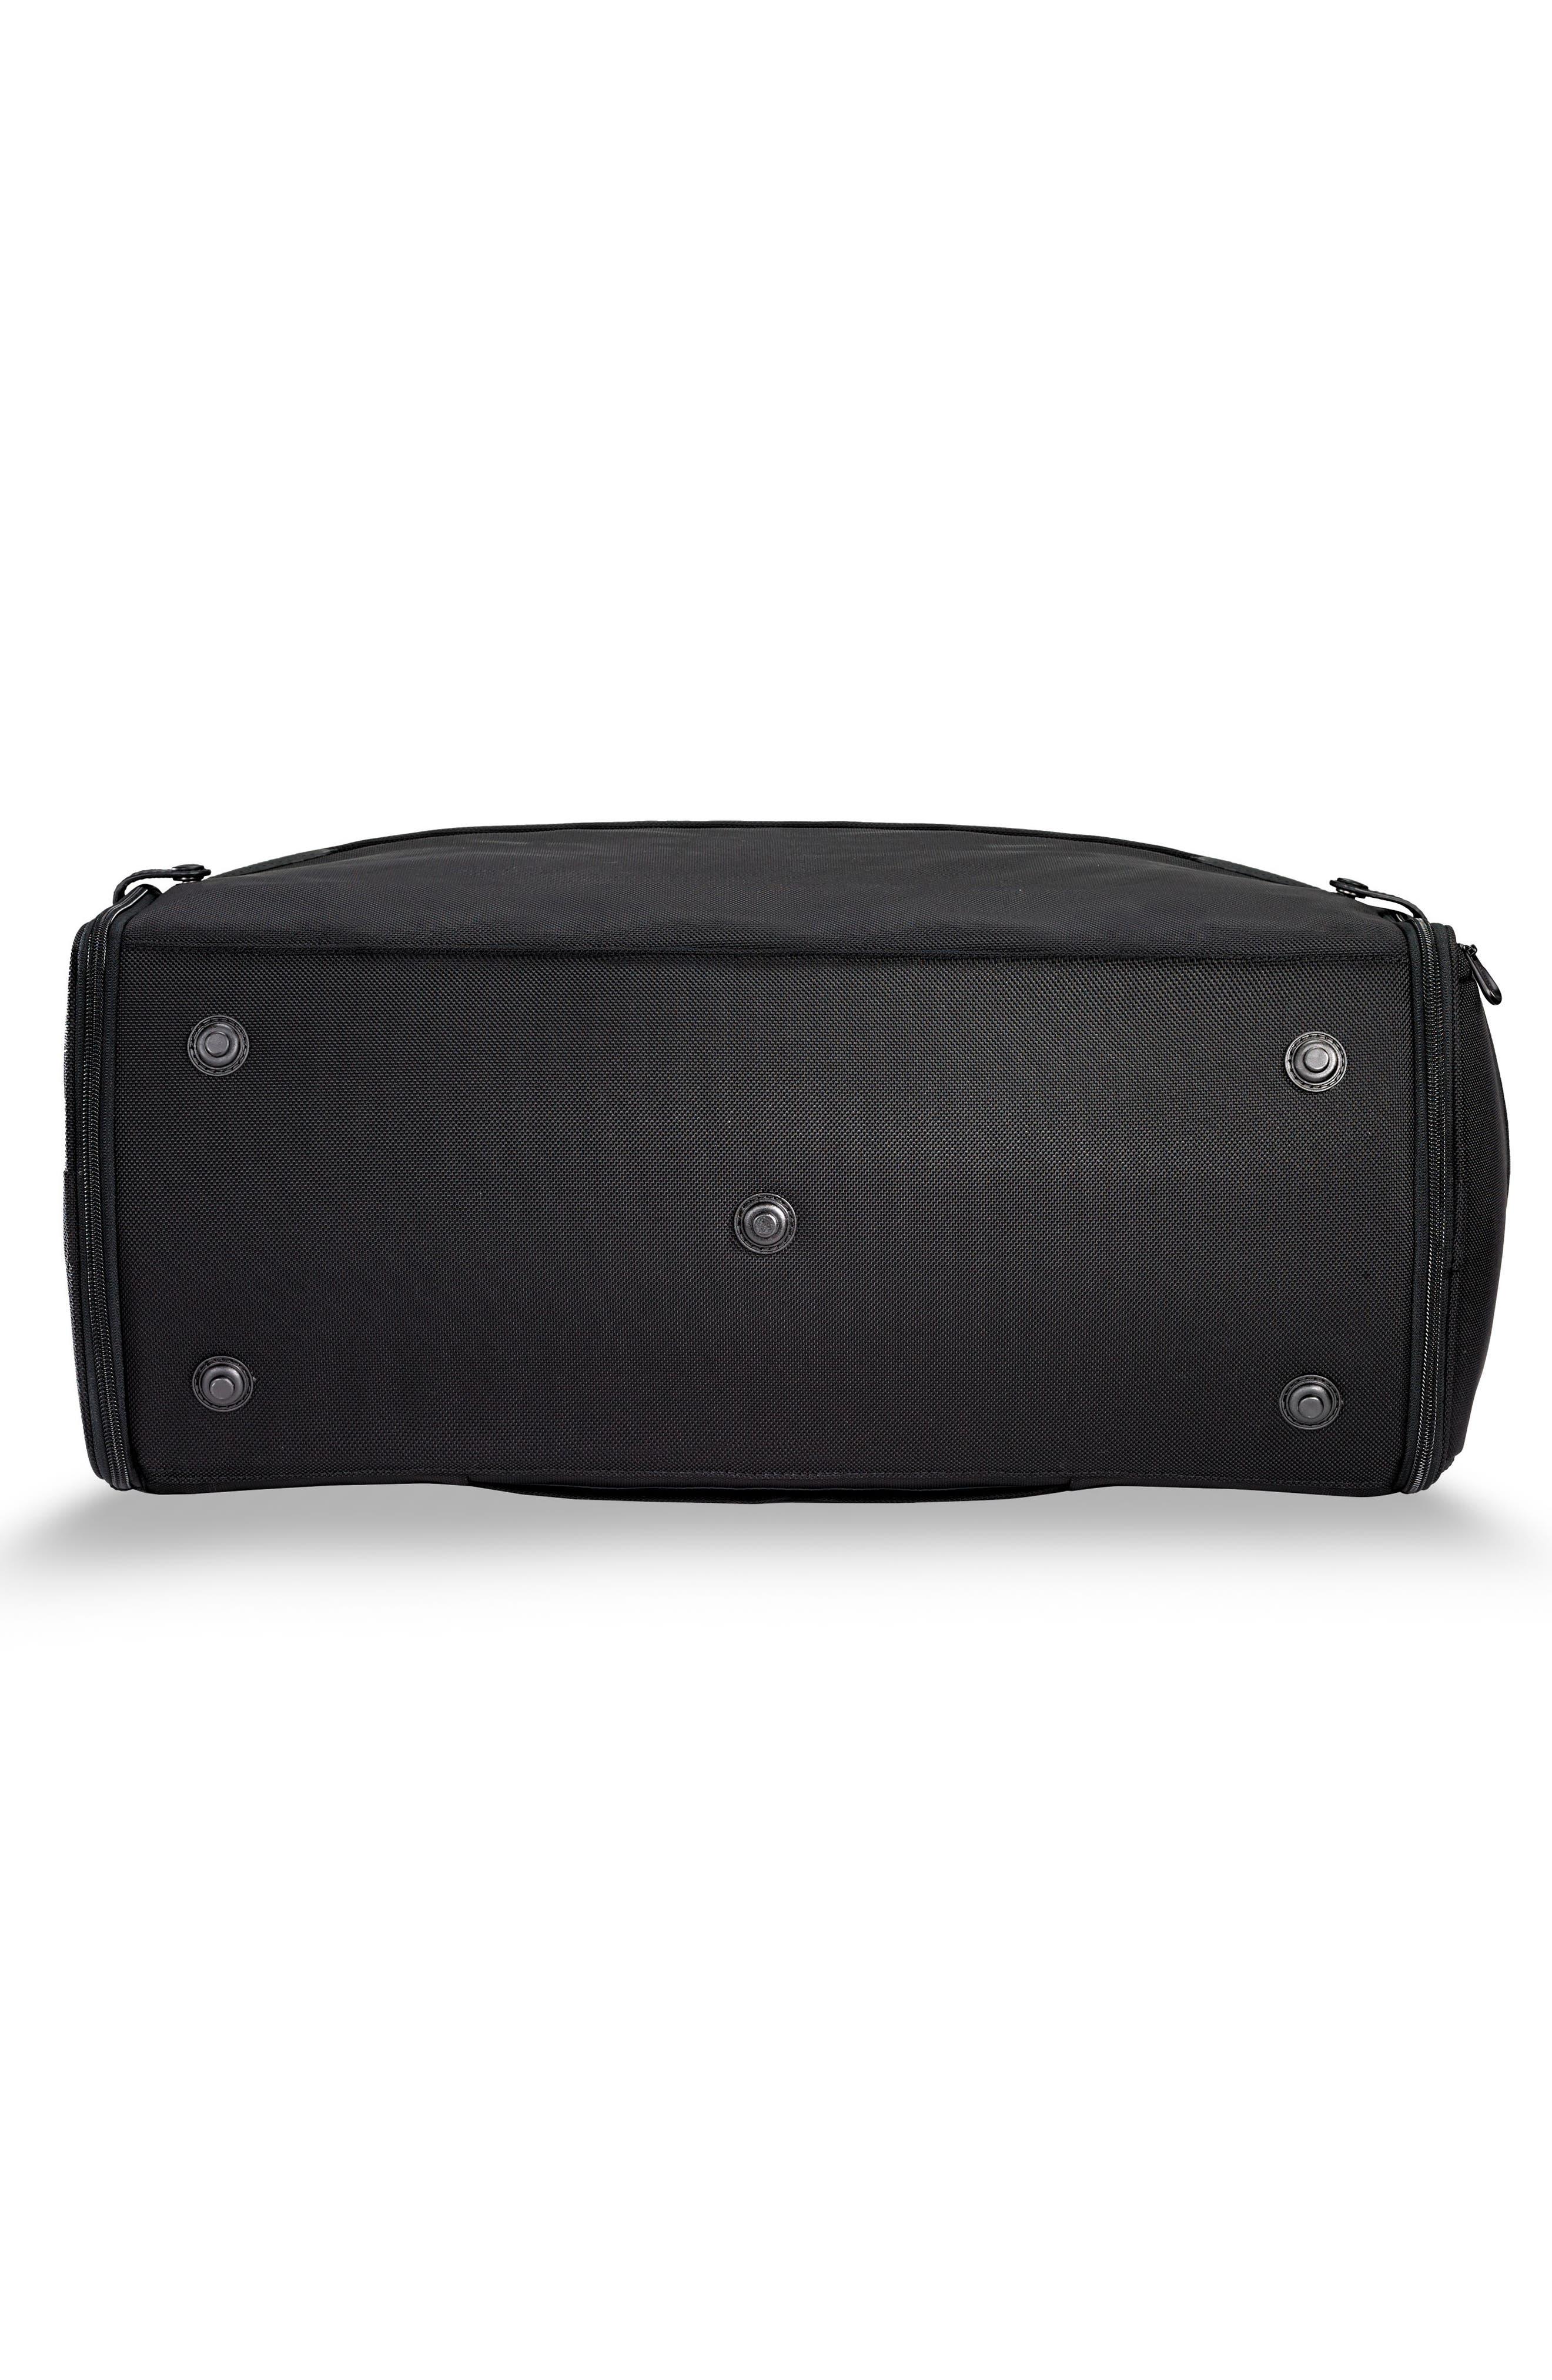 BRIGGS & RILEY,                             Baseline Suiter Duffel Bag,                             Alternate thumbnail 6, color,                             BLACK